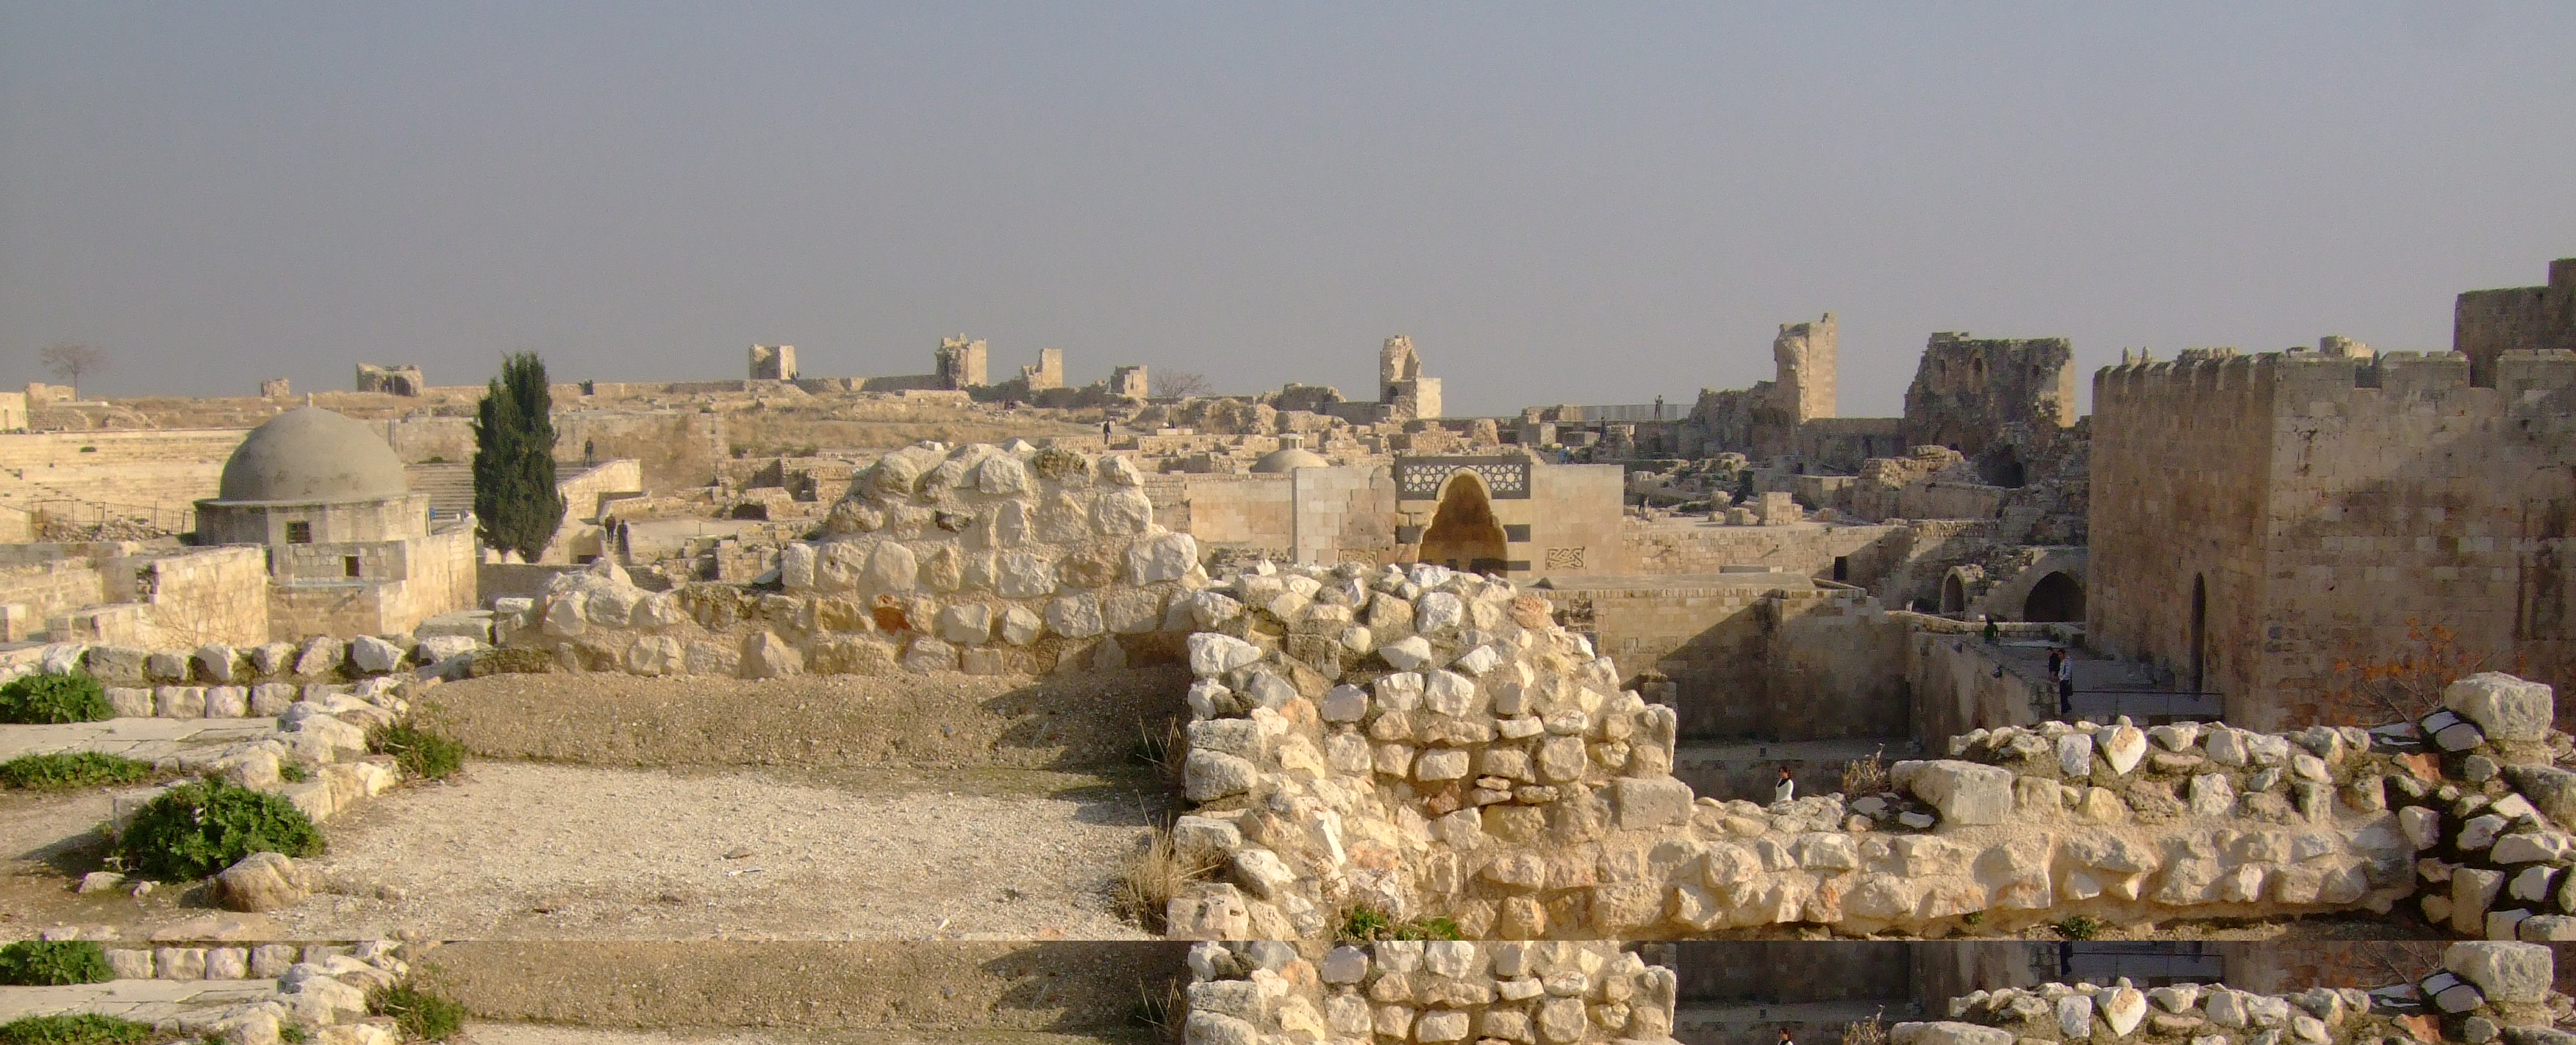 Luca Errera, Daniela Trastulli, Siria, Aleppo, cittadella